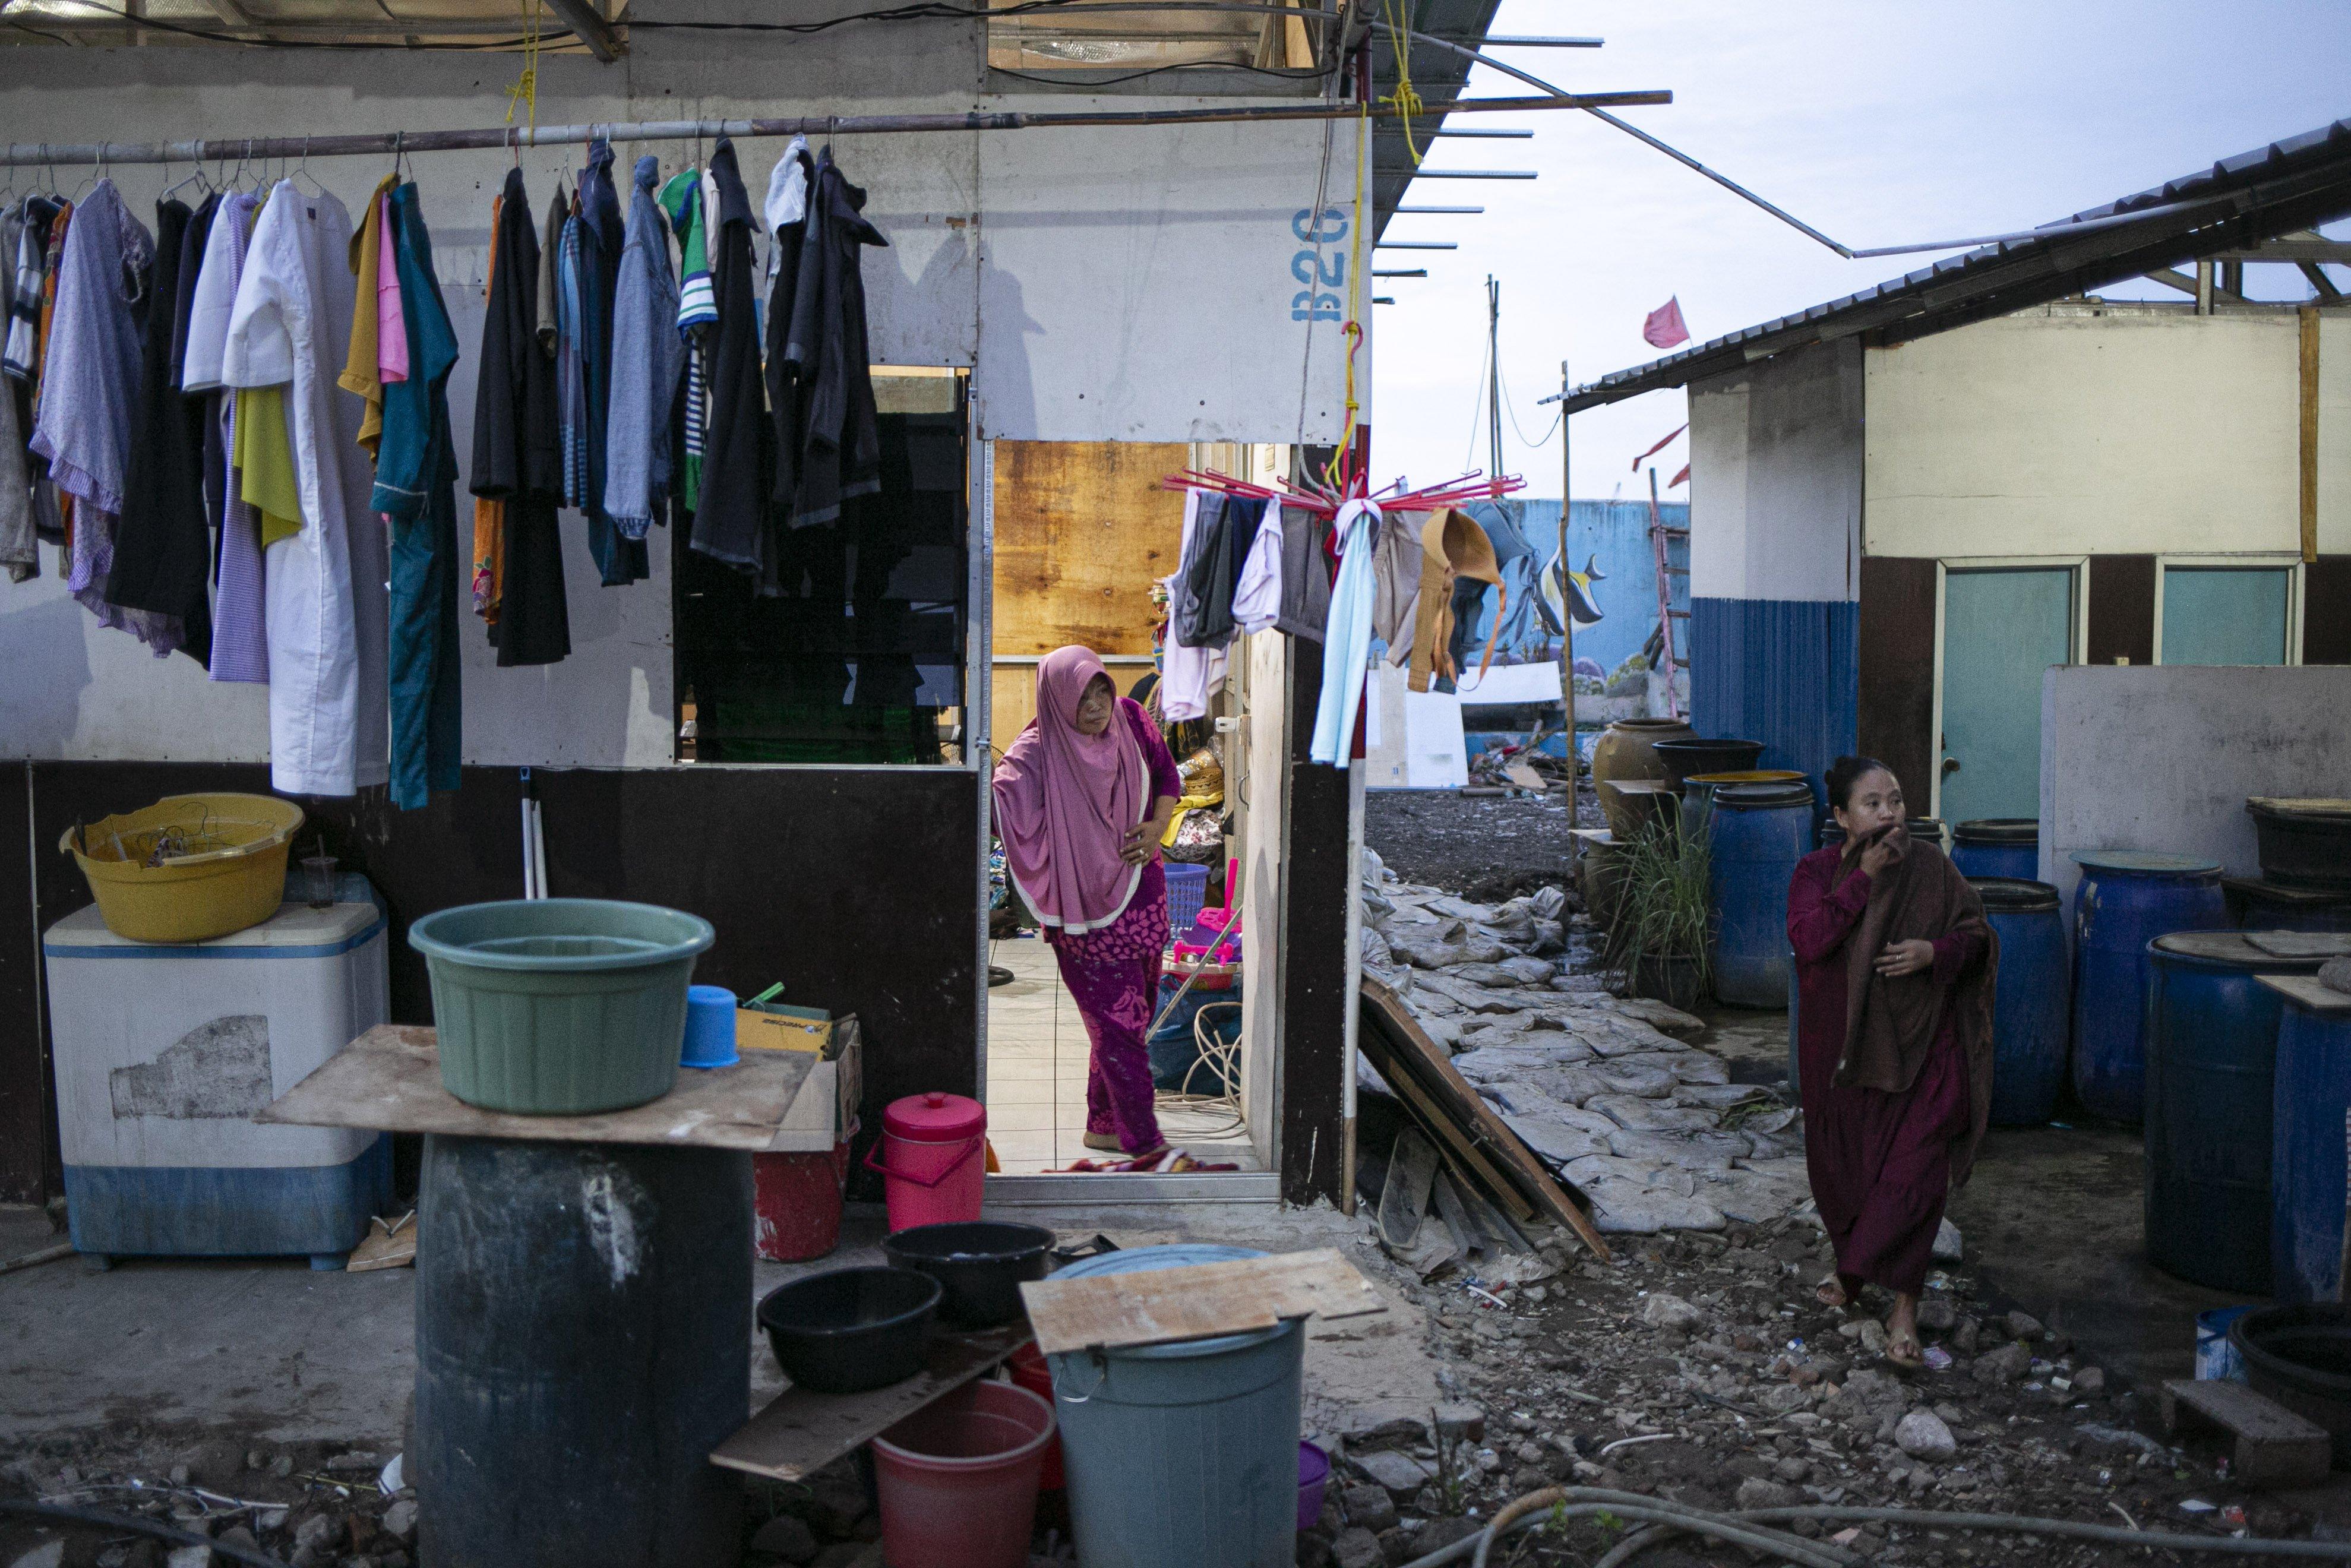 Menurut Sarjoko, rencana penataan kembali Kampung Akuarium telah melewati diskusi panjang oleh Pemerintah Provinsi DKI Jakarta. Lewat pembahasan itu, pembangunan Kampung Akuarium, kata dia, telah sesuai dengan ketentuan dan aturan yang berlaku sebagai hunian massal di kawasan Cagar Budaya Kota Tua Jakarta.